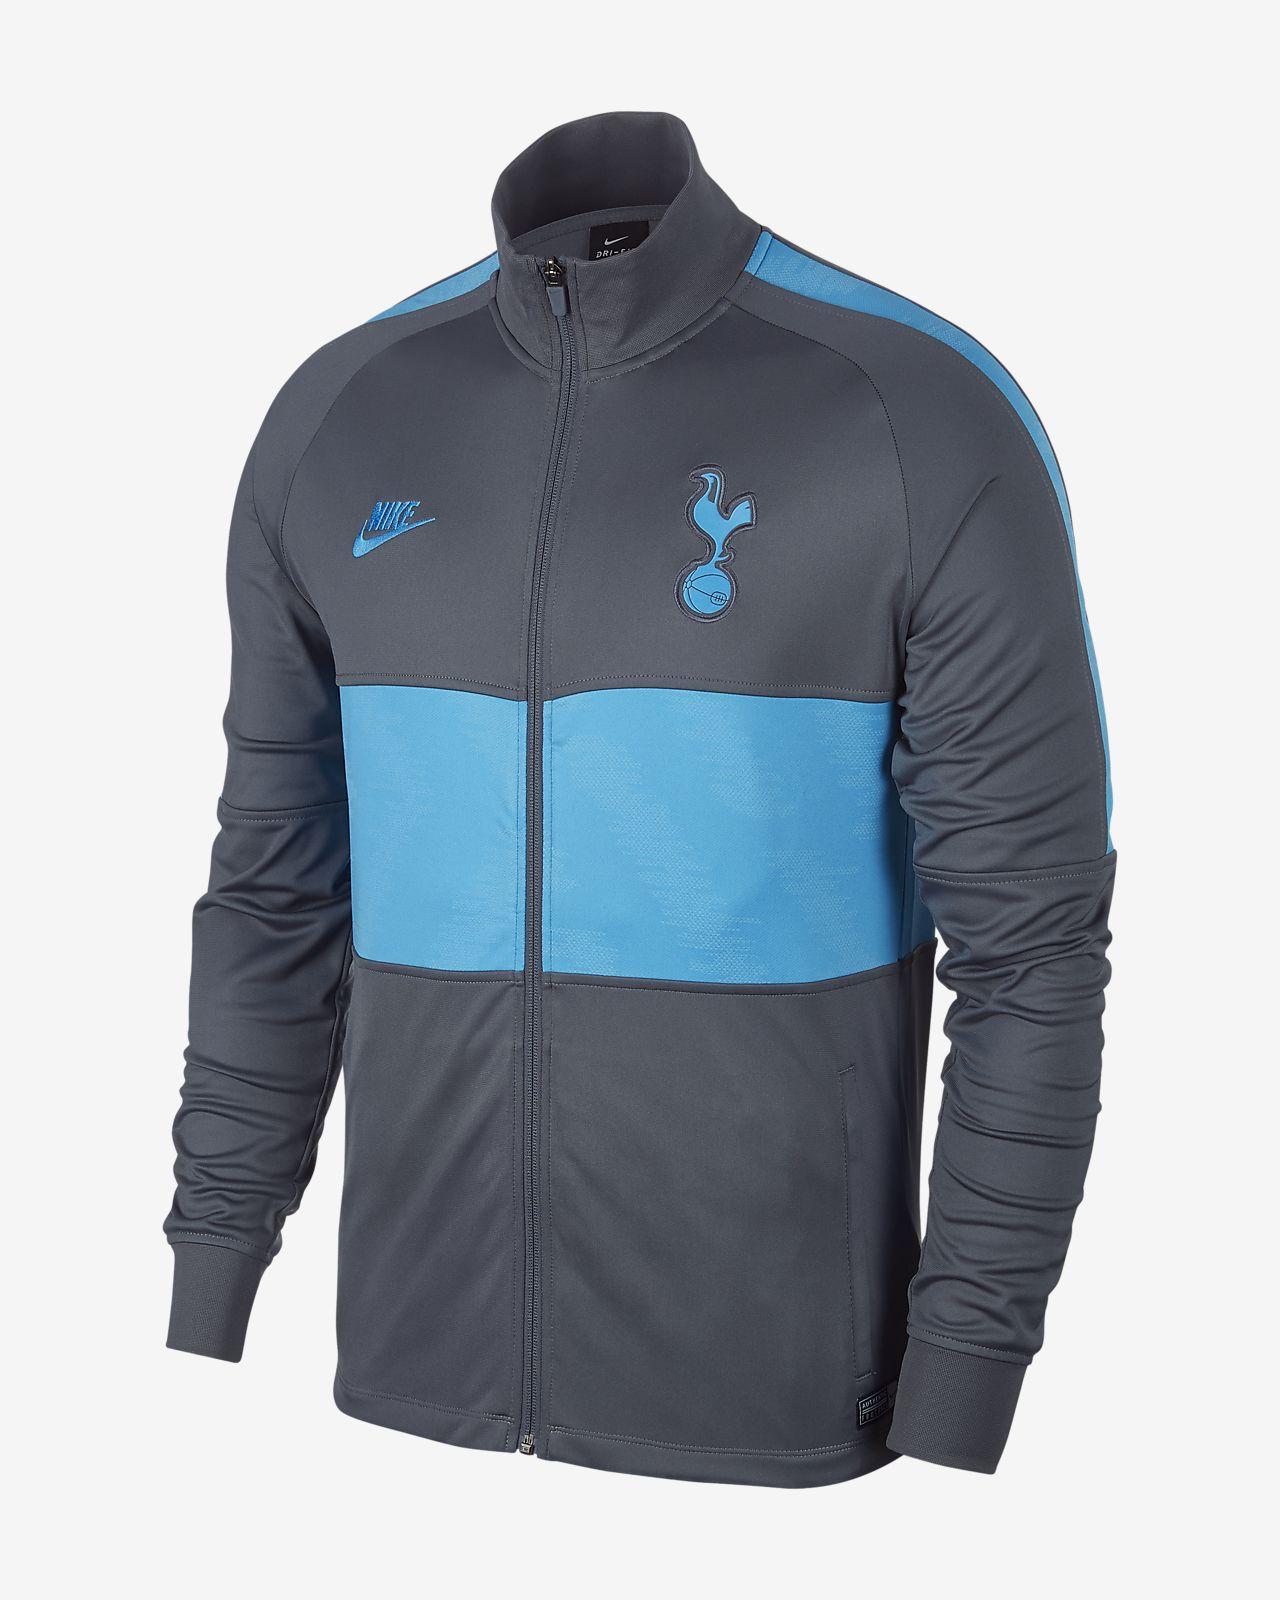 Jacken | Jacken Für Herren Nike Trainings Tottenham Hotspur